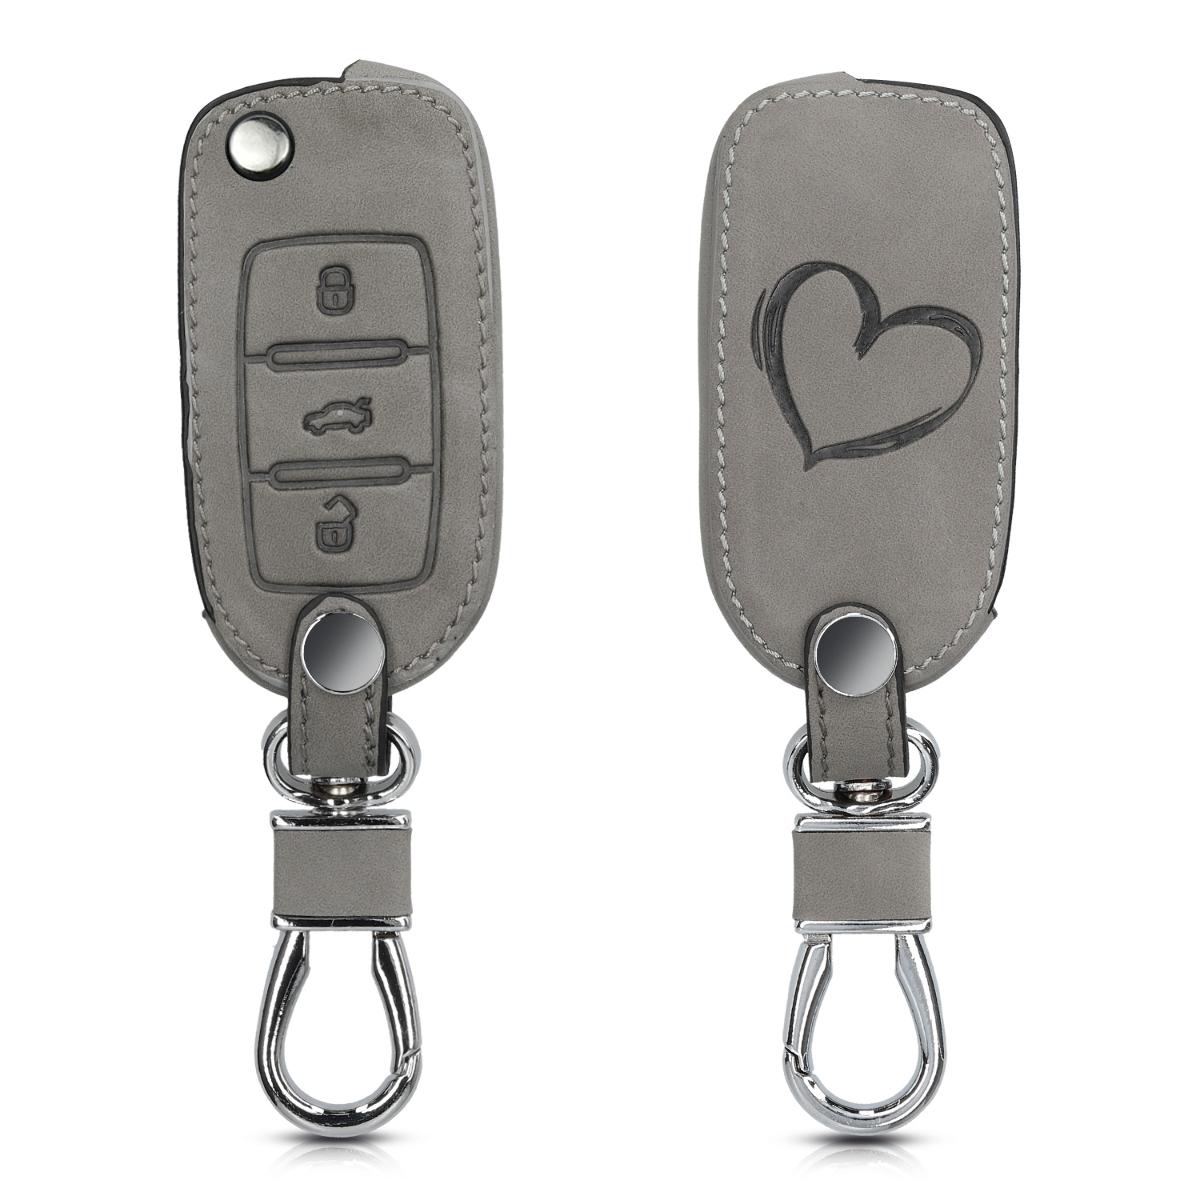 KW Θήκη Κλειδιού VW / Skoda / Seat - Συνθετικό Δέρμα - 3 Κουμπιά - Grey (48571.06)